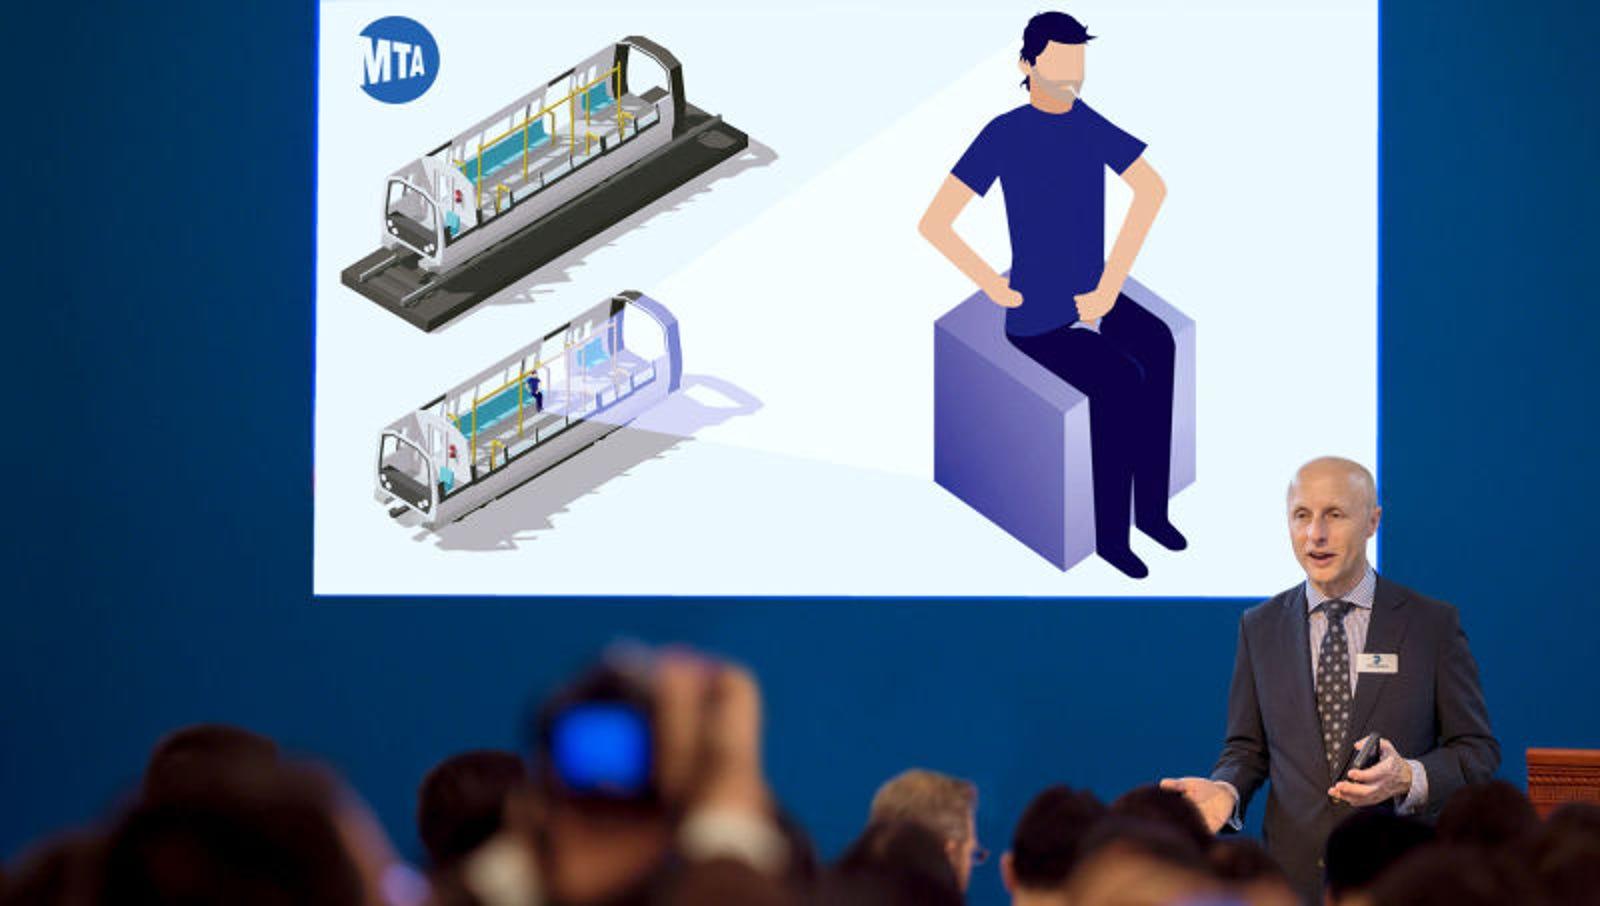 MTA Unveils $28 Billion Plan To Renovate Subway Masturbators